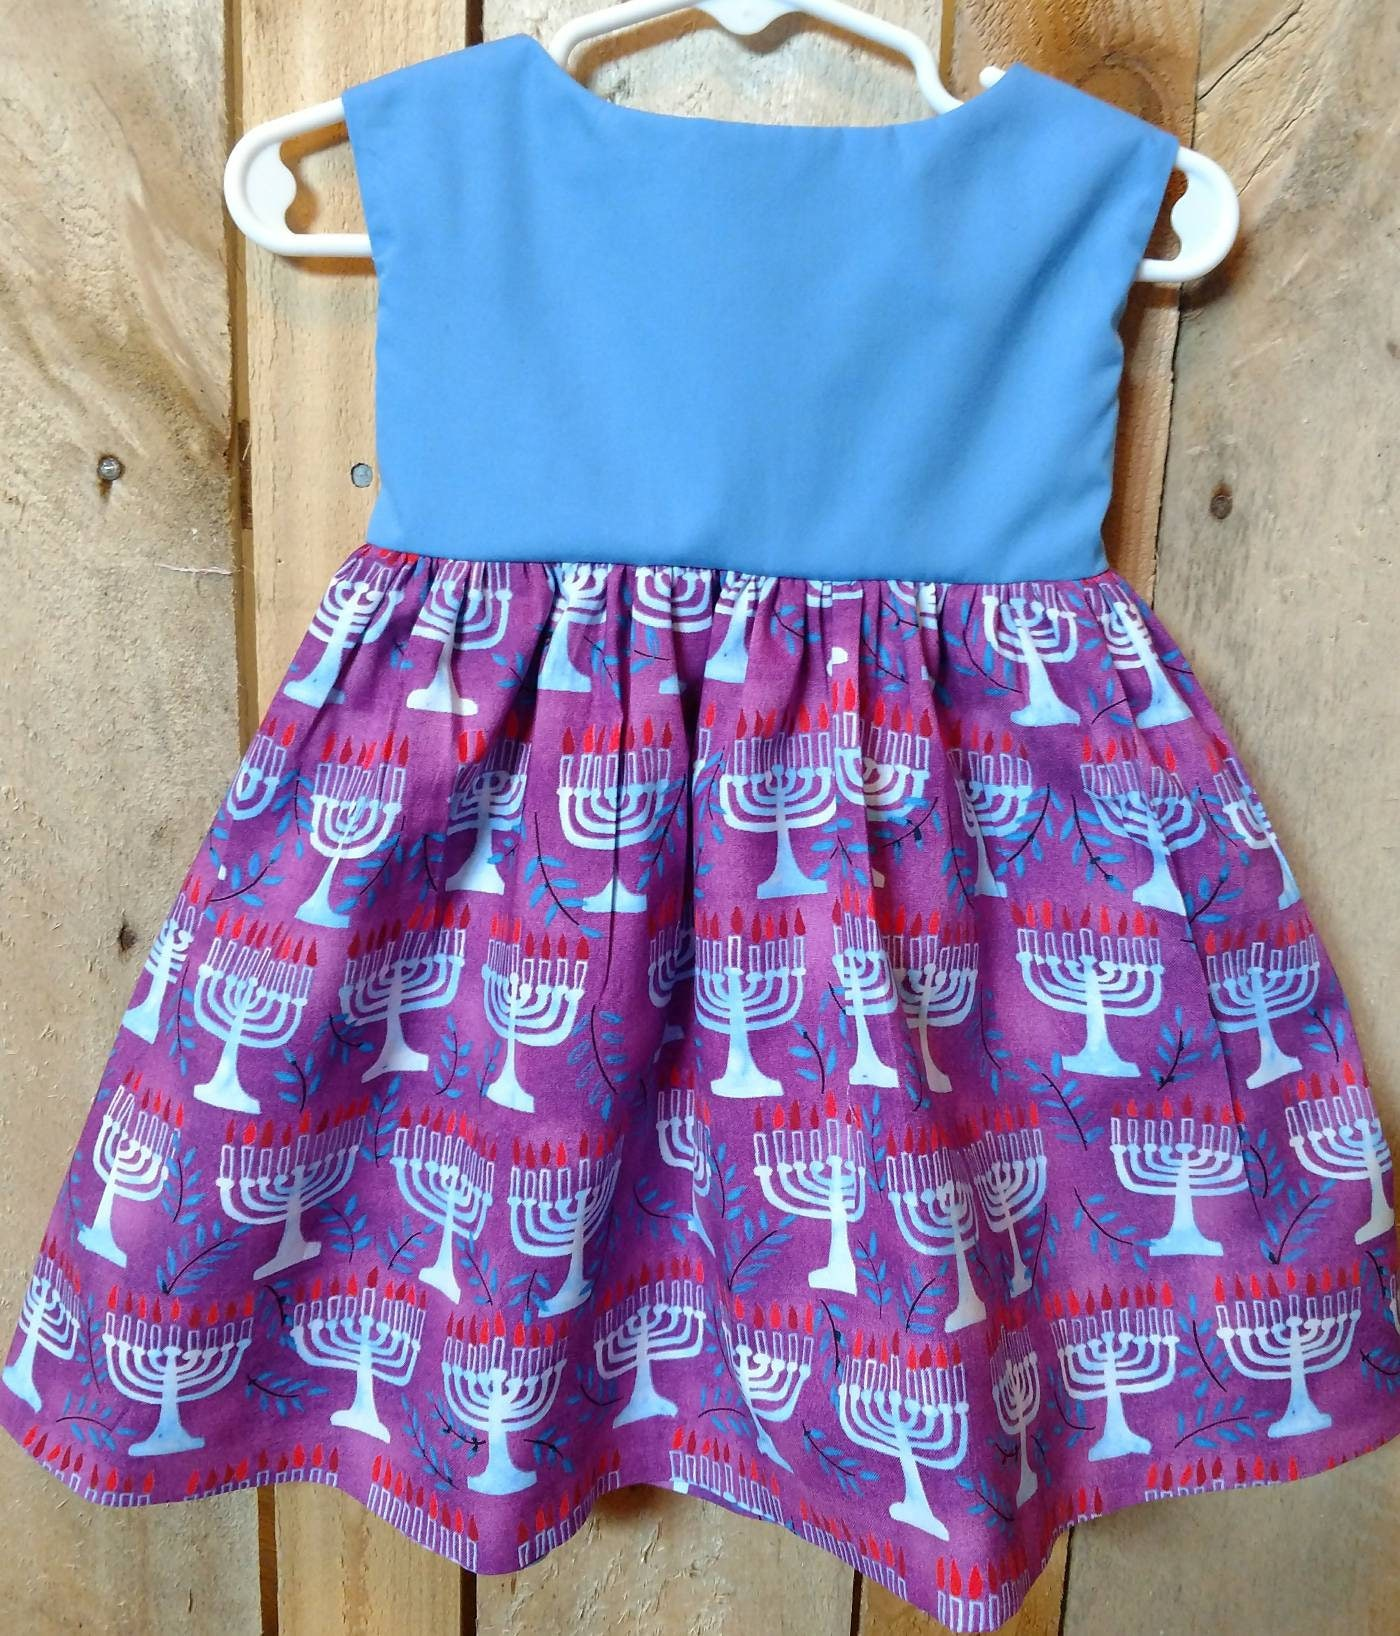 Hanukkah toddler dress Hanukkah dress for baby Hanukkah girl dress